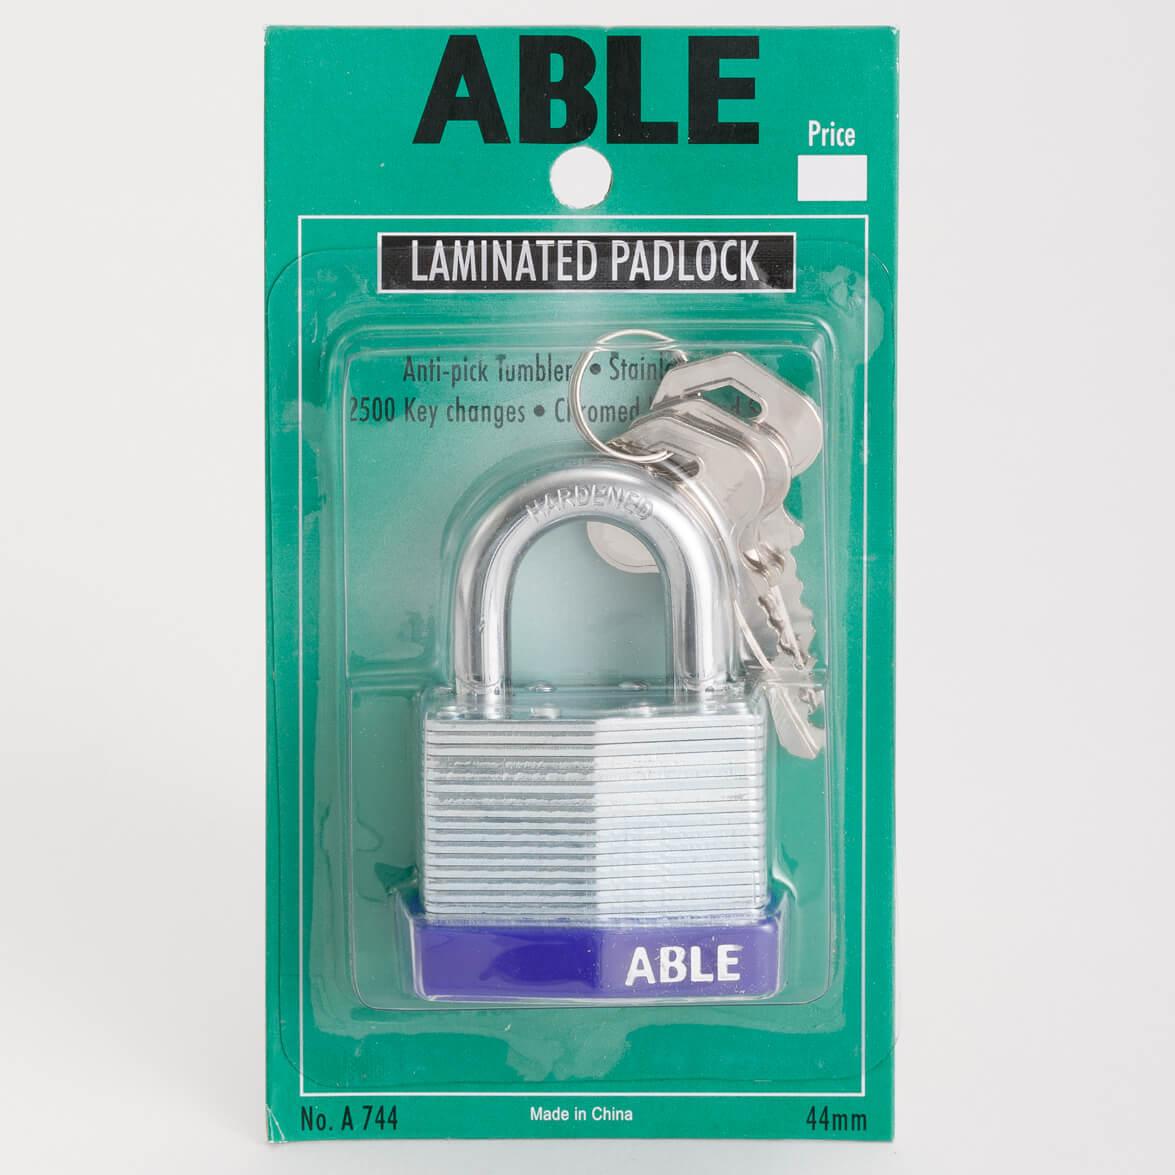 Able laminated anti pick padlock